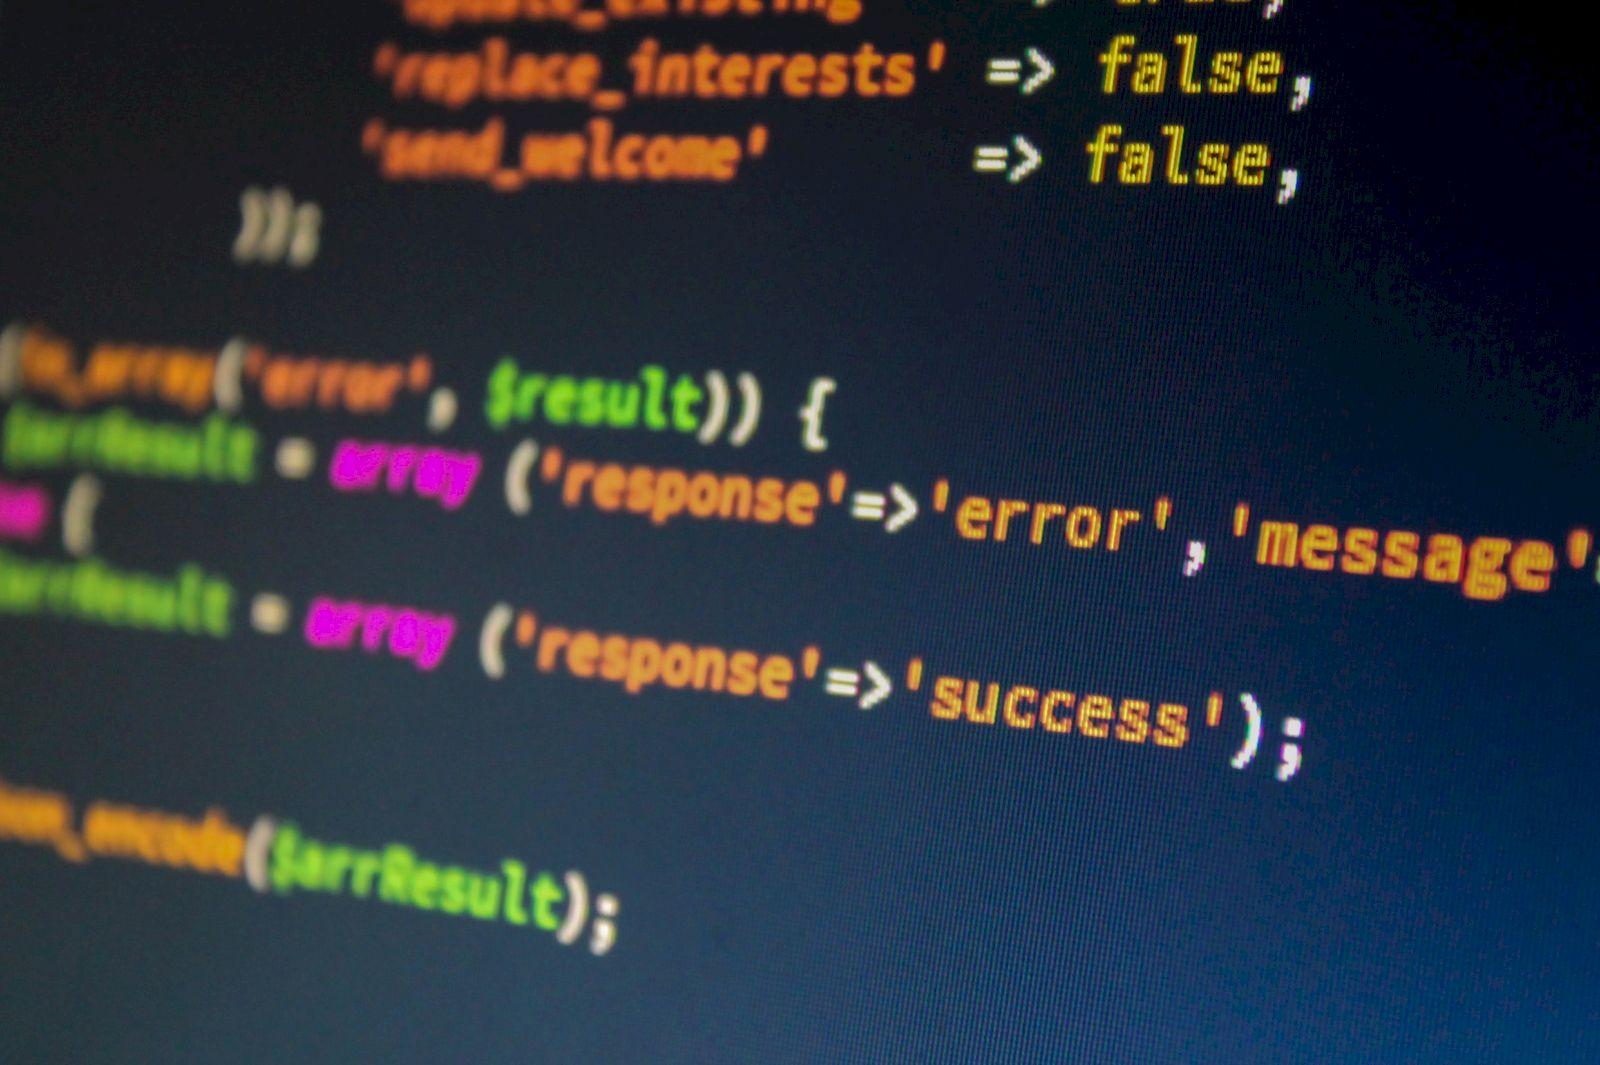 ¿Cómo enviar datos de un formulario a Hubspot API Javascript?